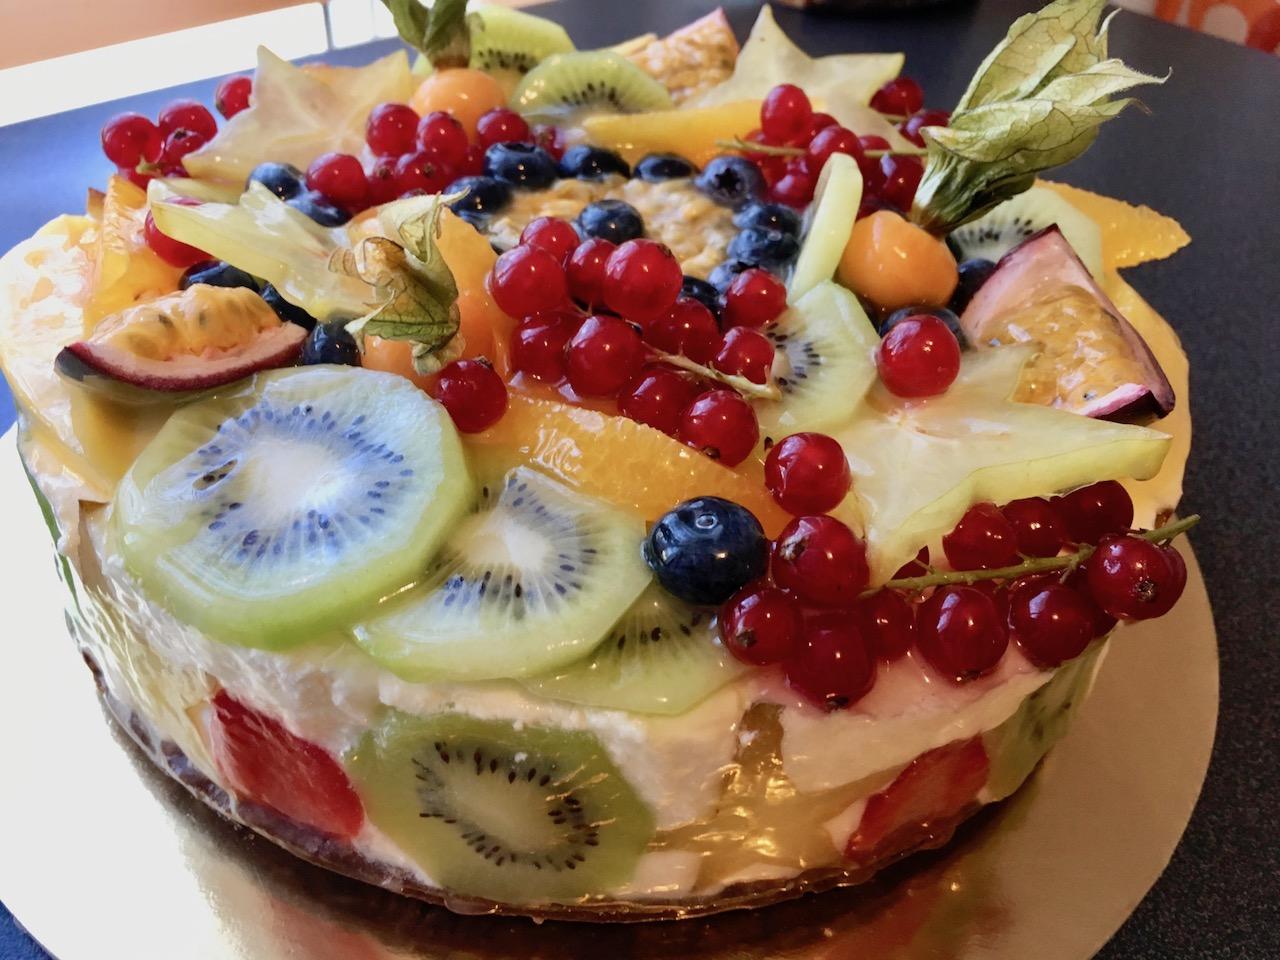 Cheese cake frutta mista